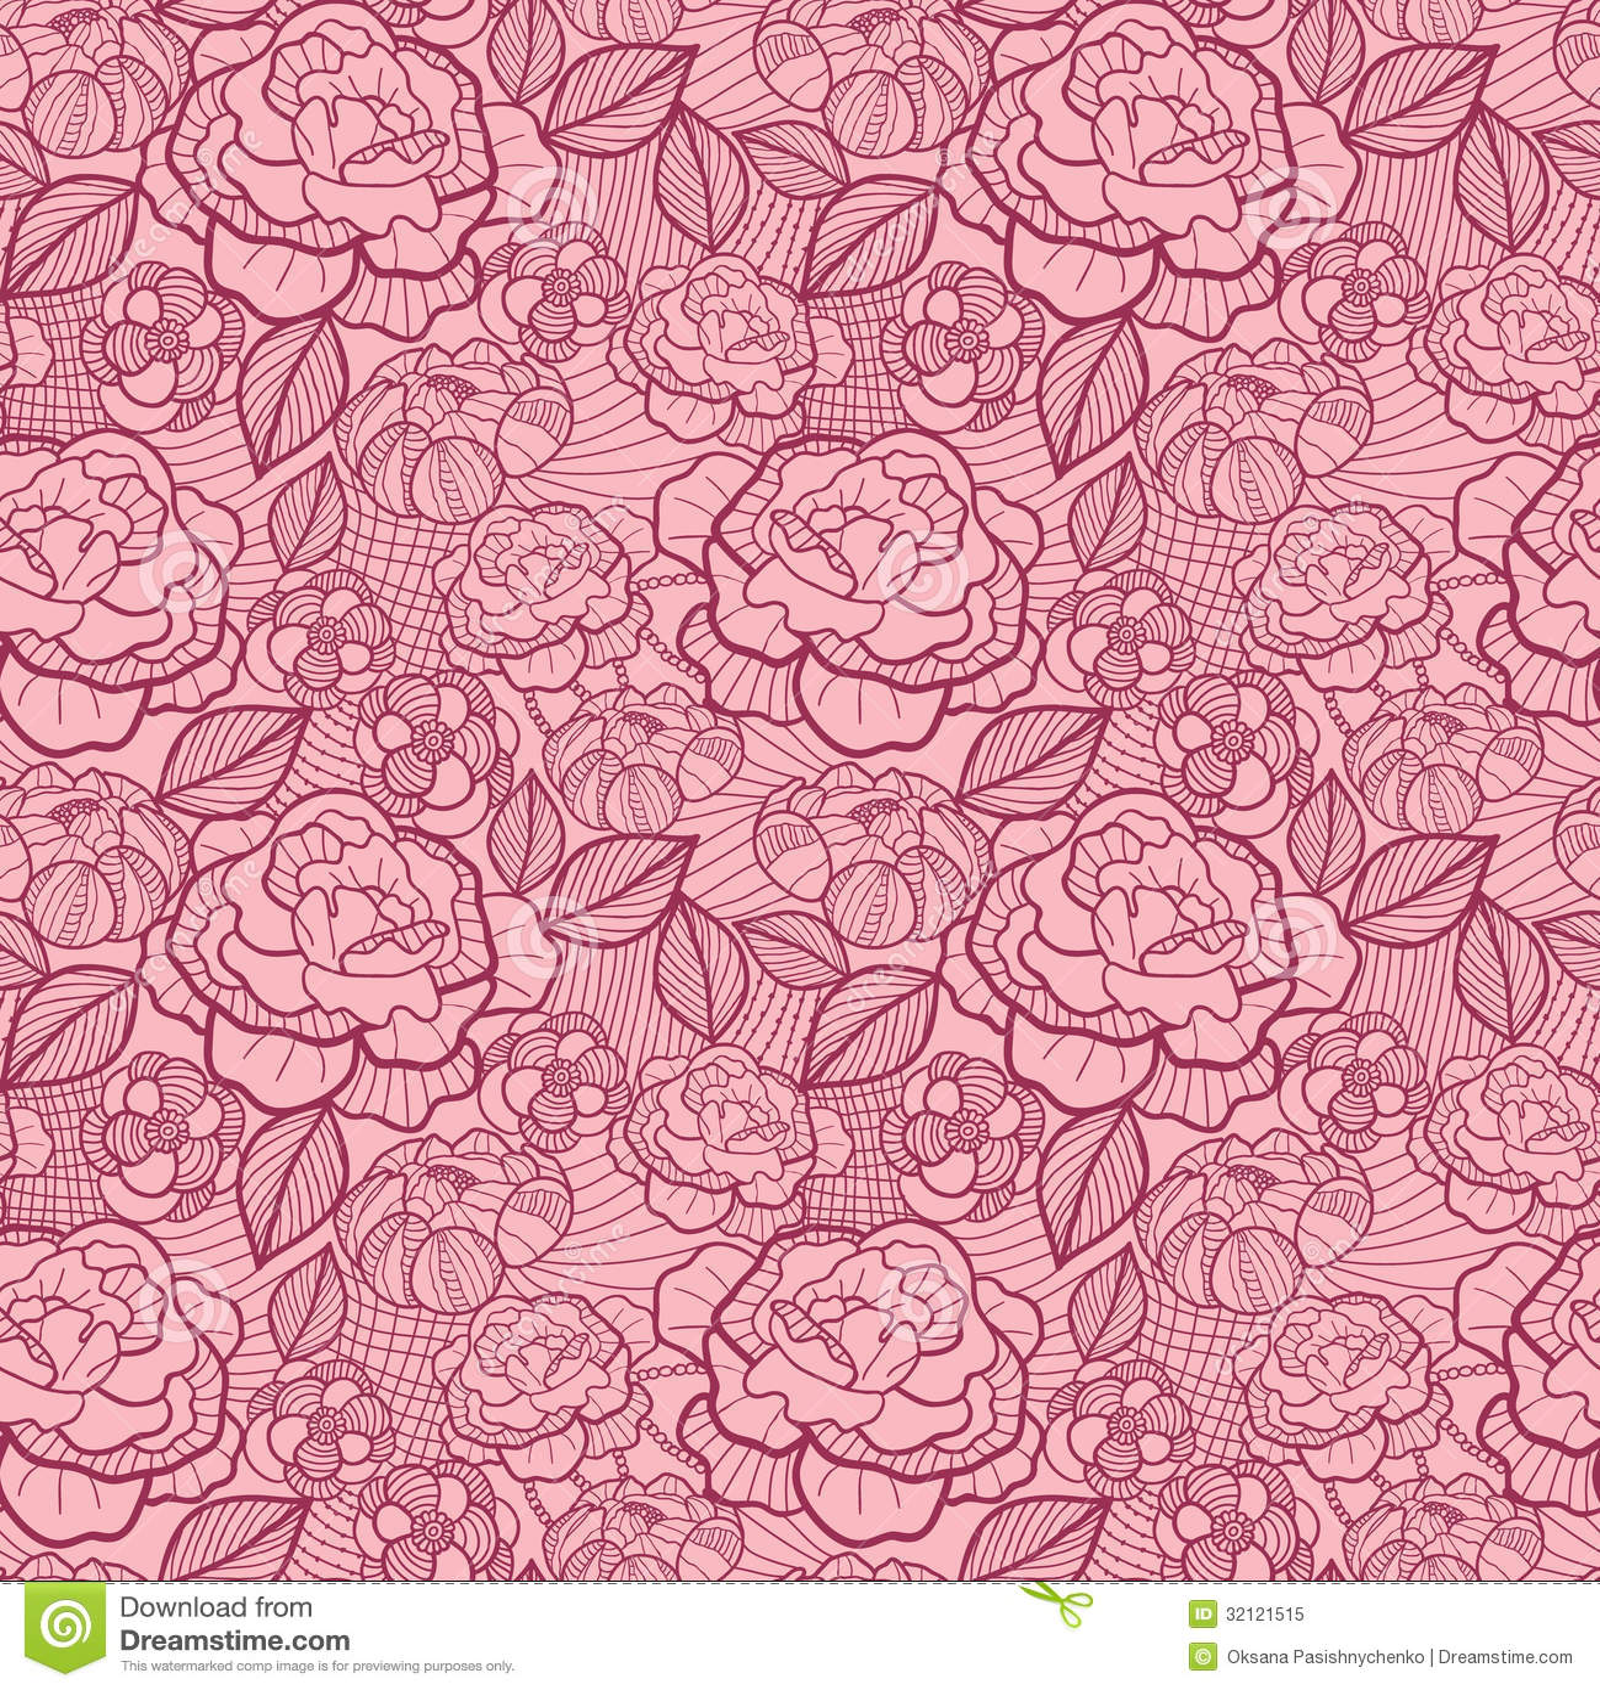 Line Art Flower Pattern : Red line art flowers seamless pattern background royalty